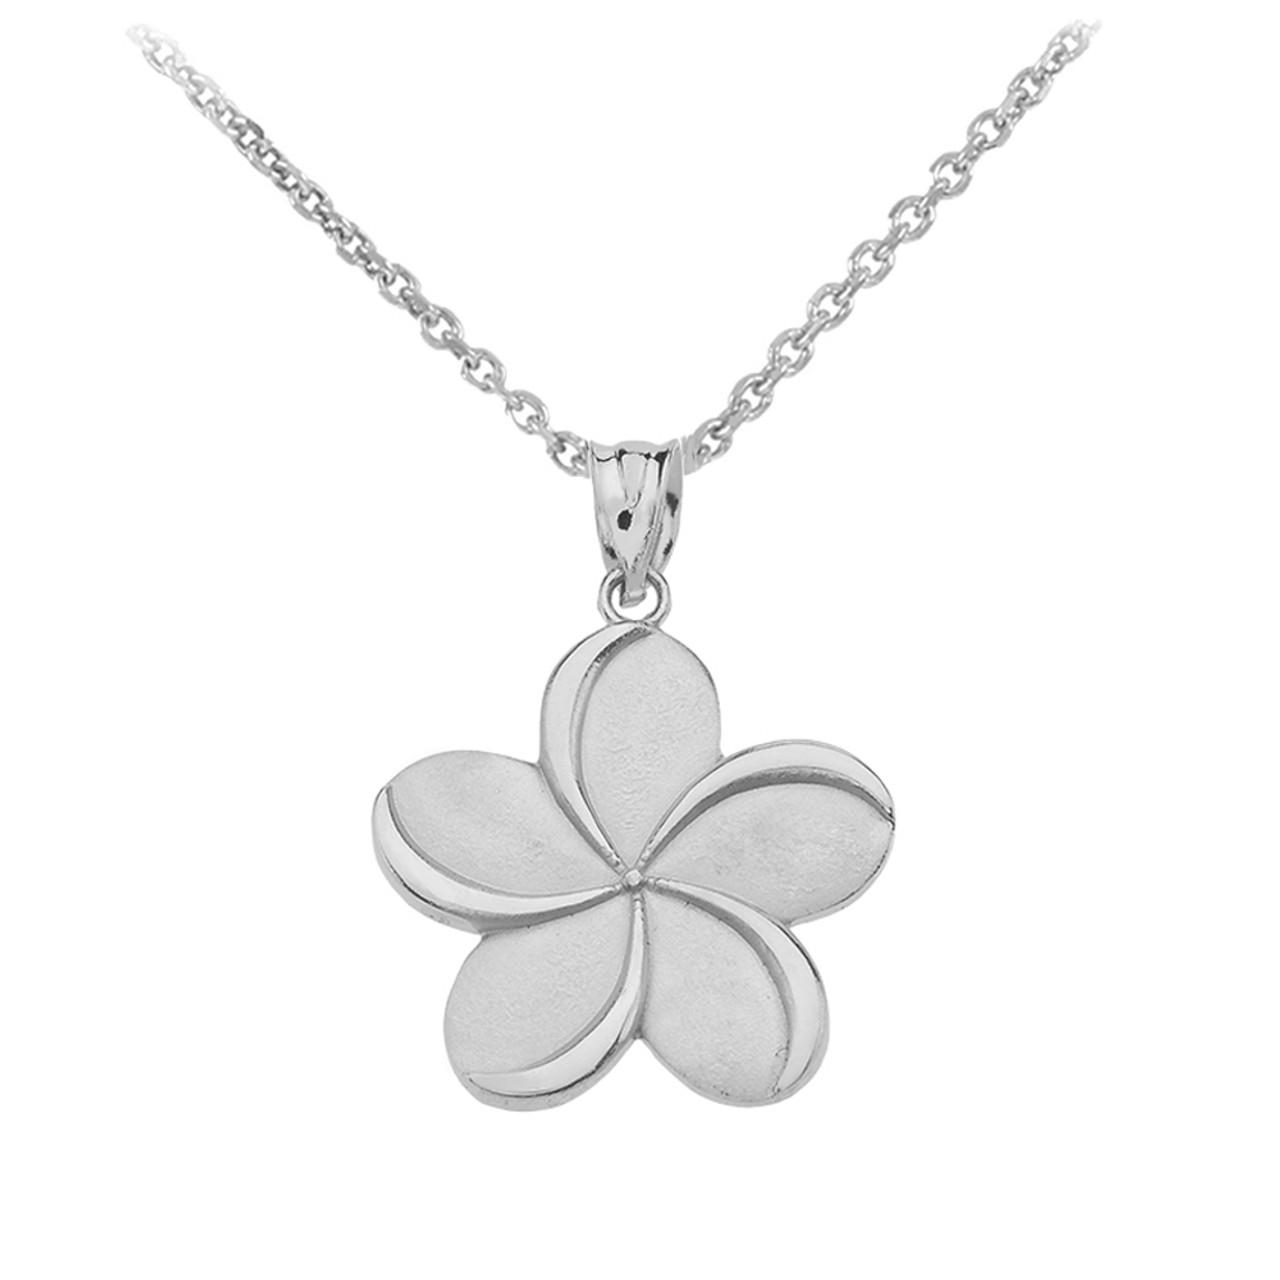 White Gold Hawaiian Plumeria Flower Pendant Necklace